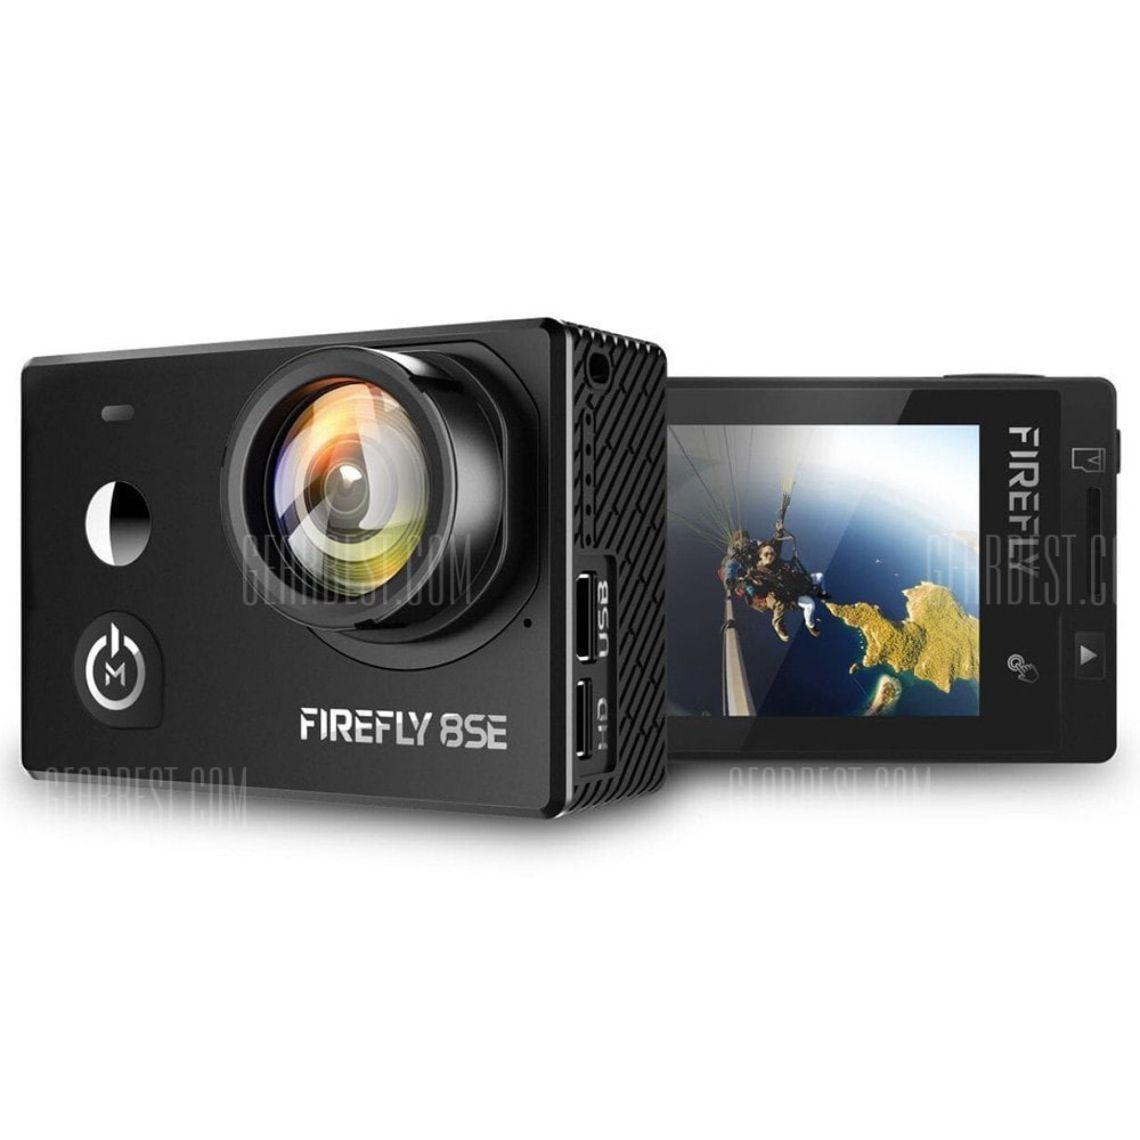 Hawkeye Firefly 8SE 4K Action Camera - $139.99 Free Shipping|GearBest.com